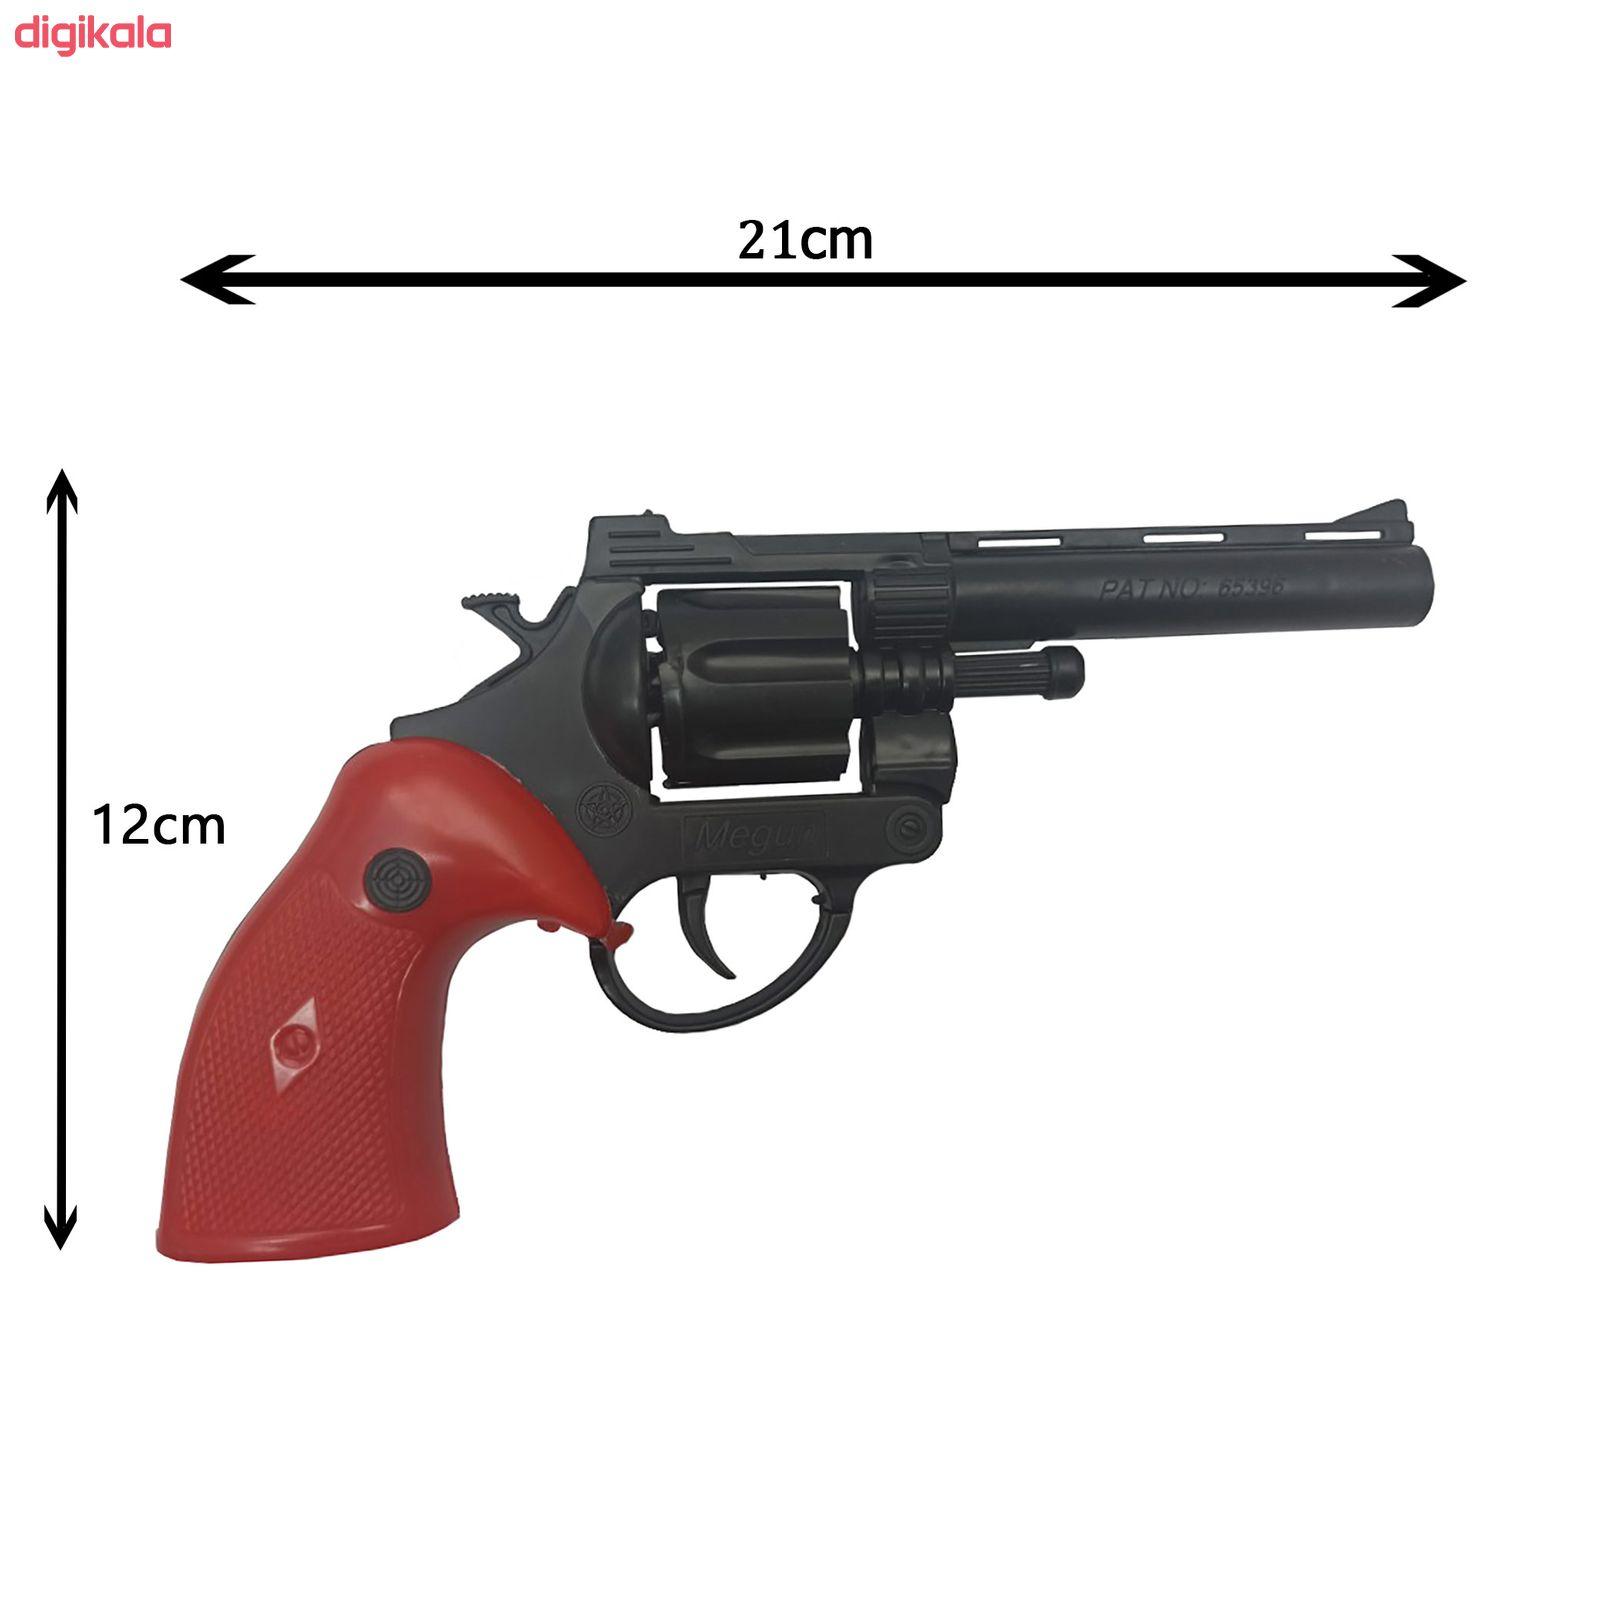 تفنگ بازی گلدن گان مدل naabsell-p70 مجموعه 3 عددی main 1 1